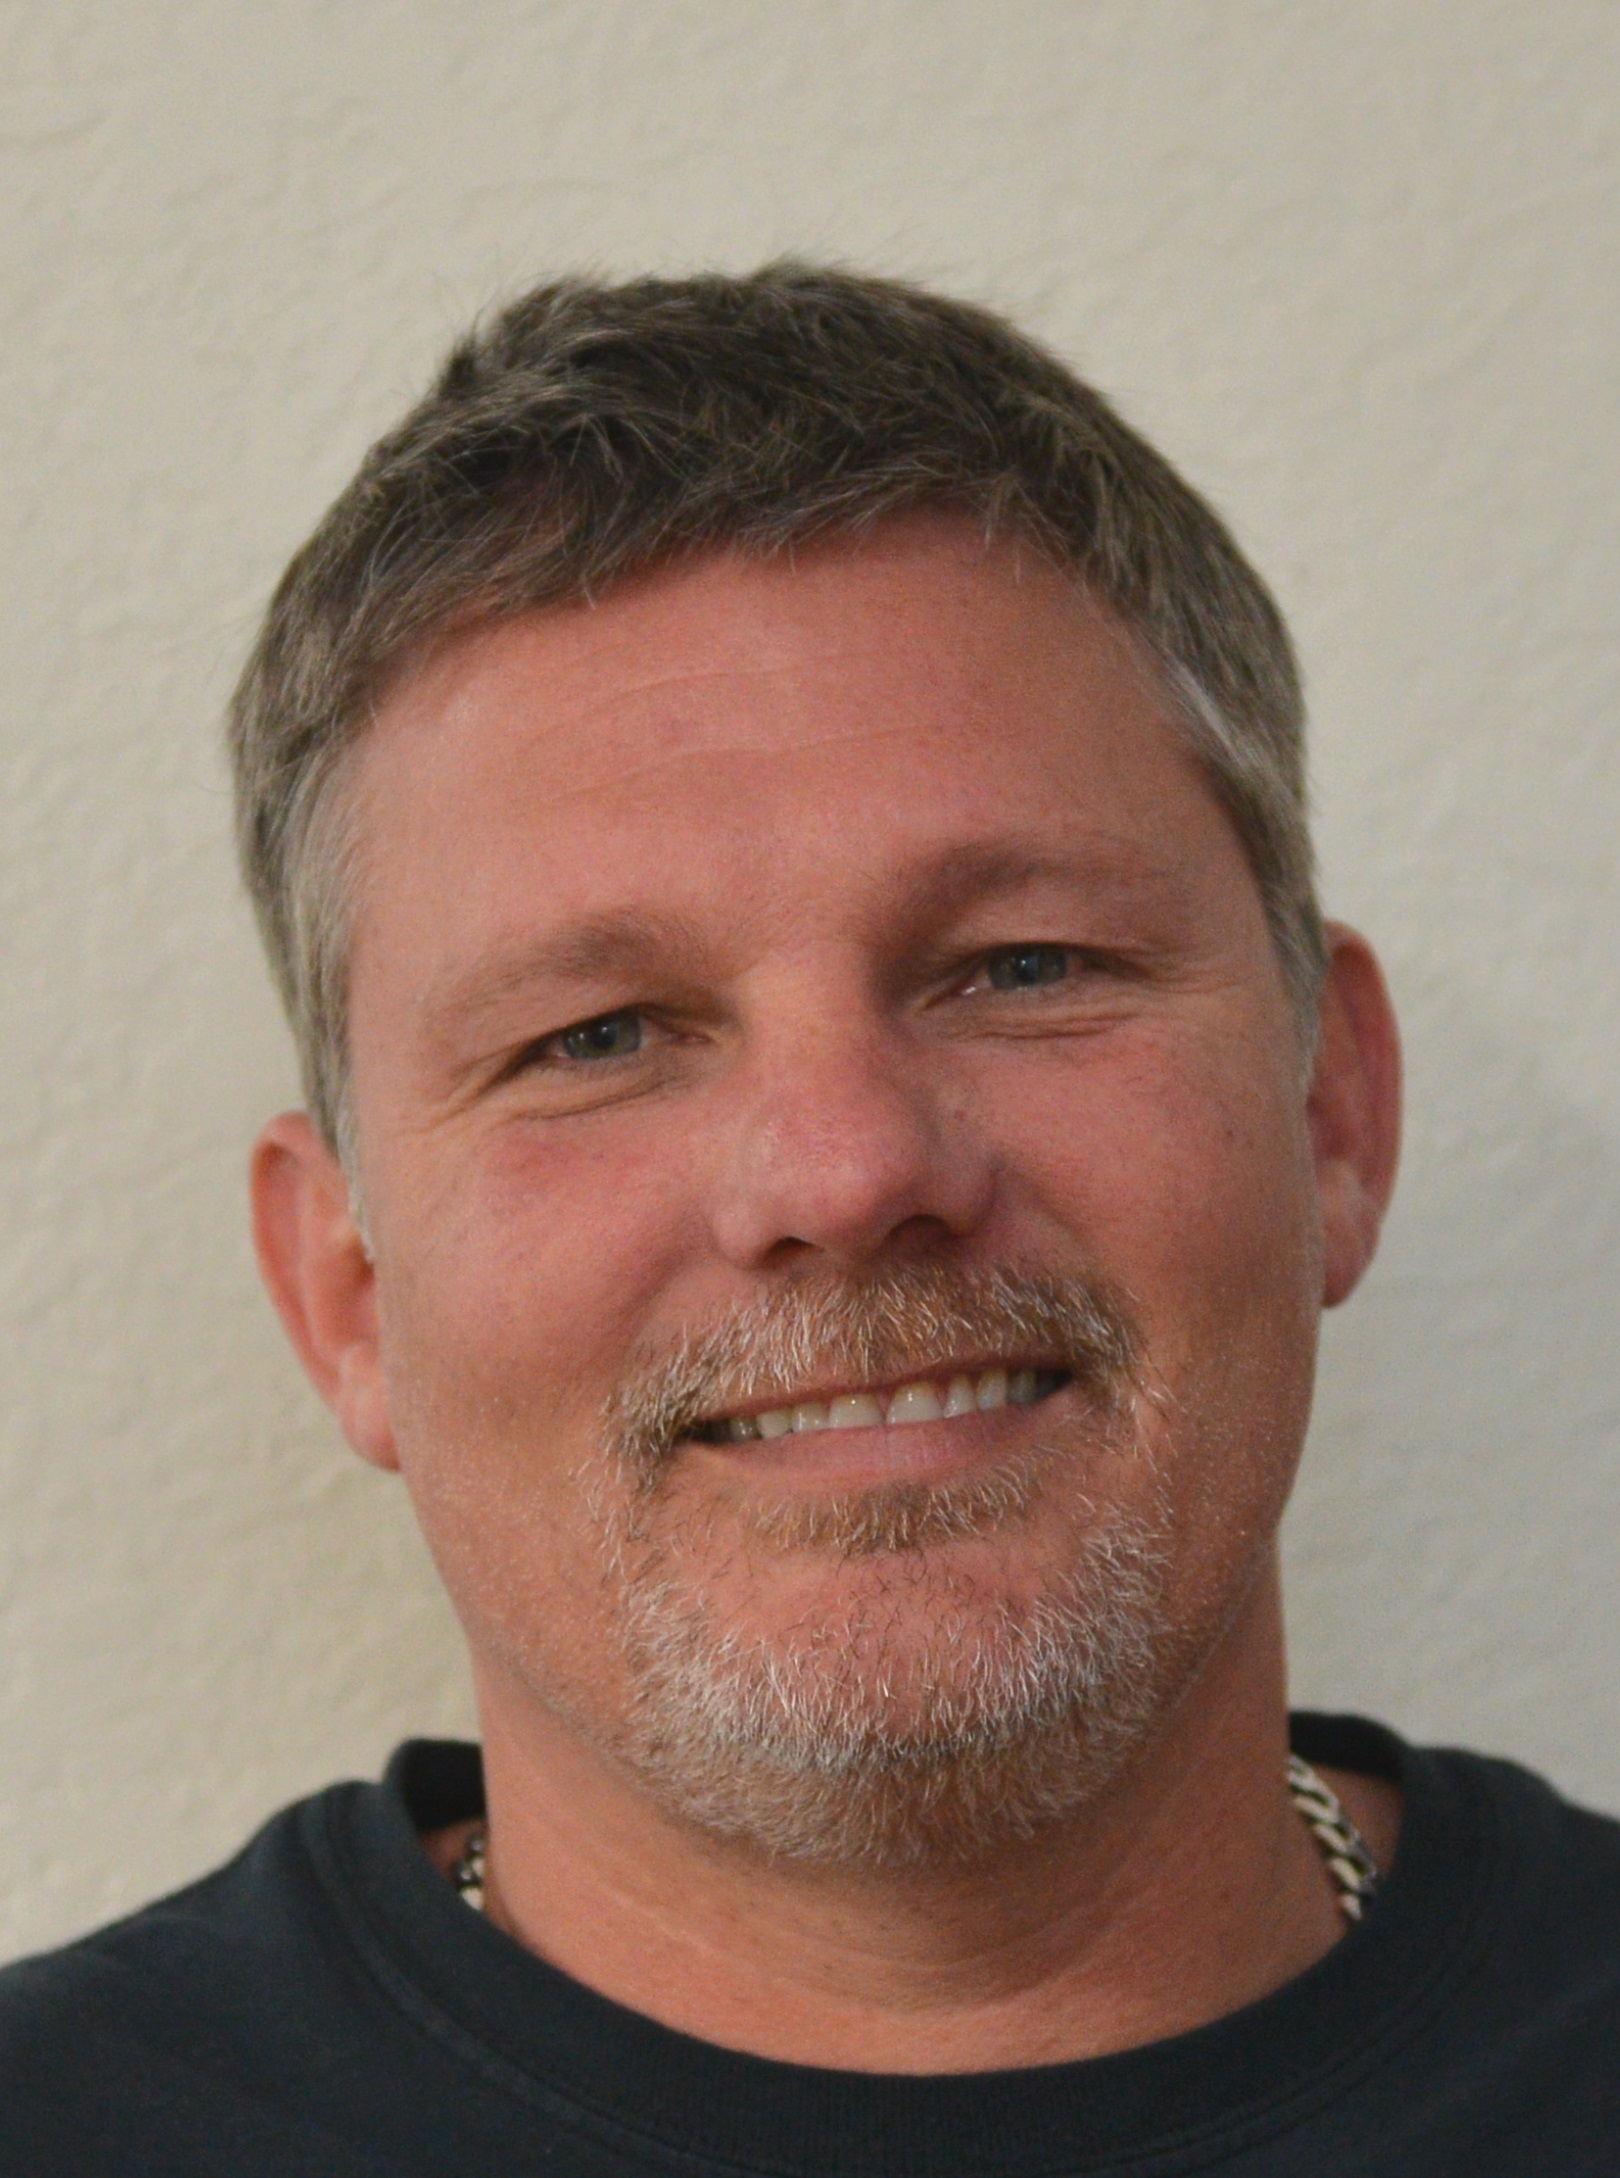 Greg Skidmore